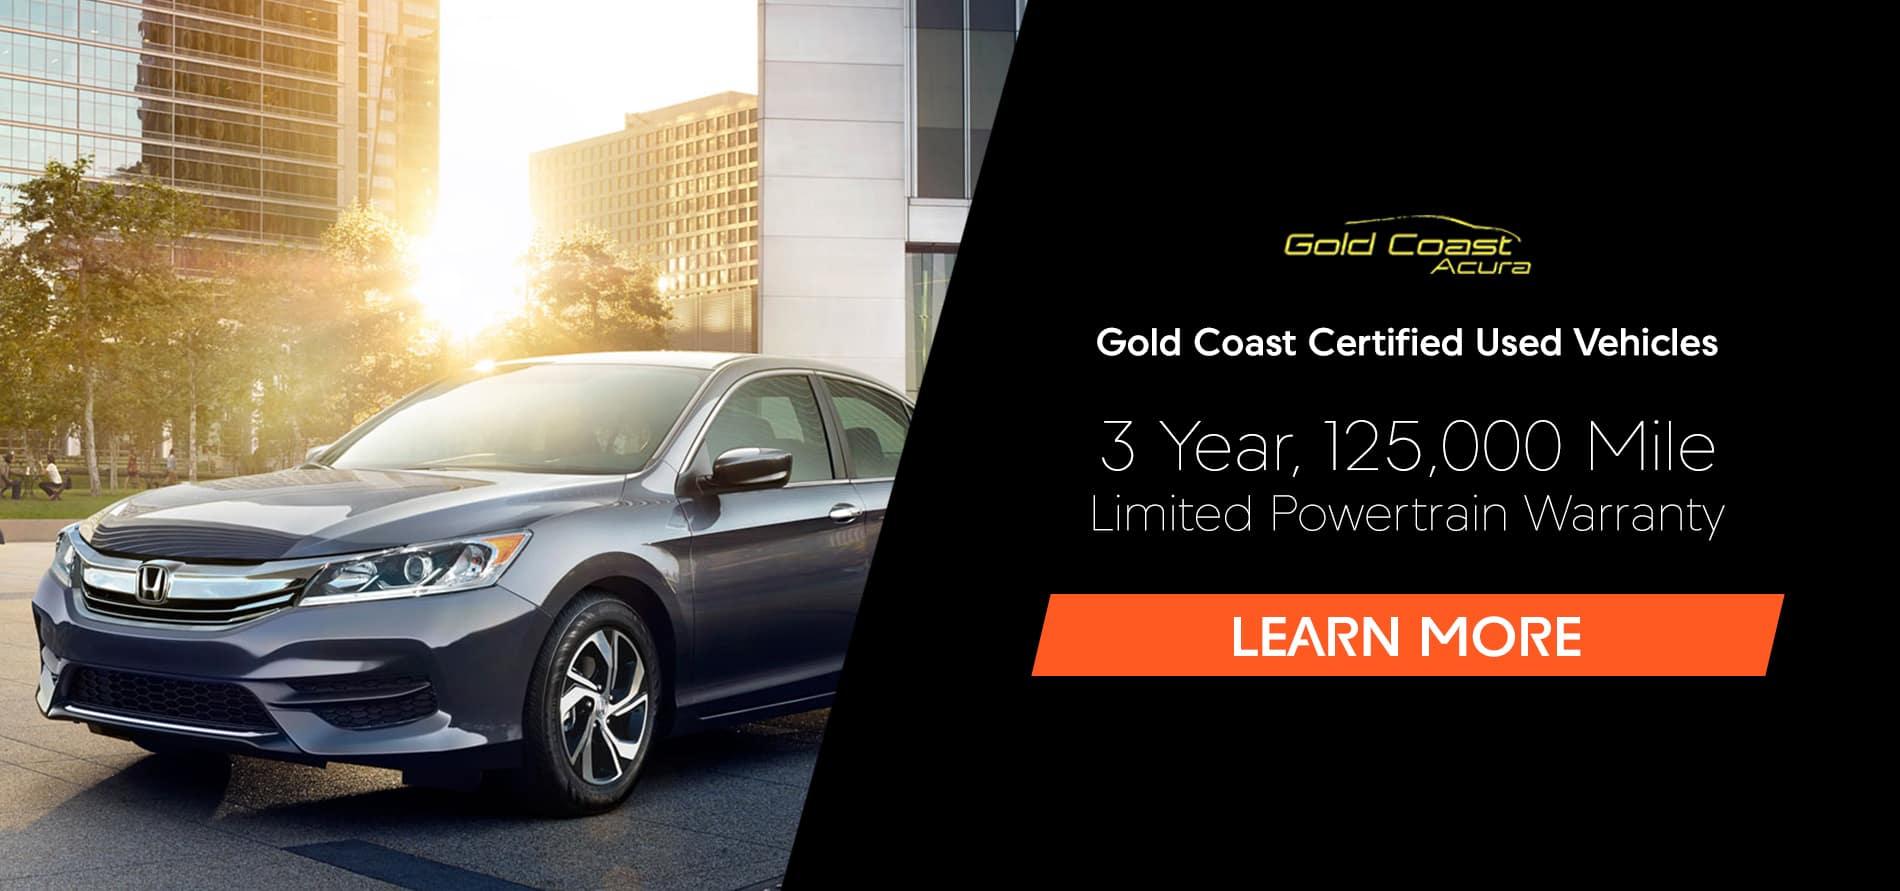 Gold coast certified